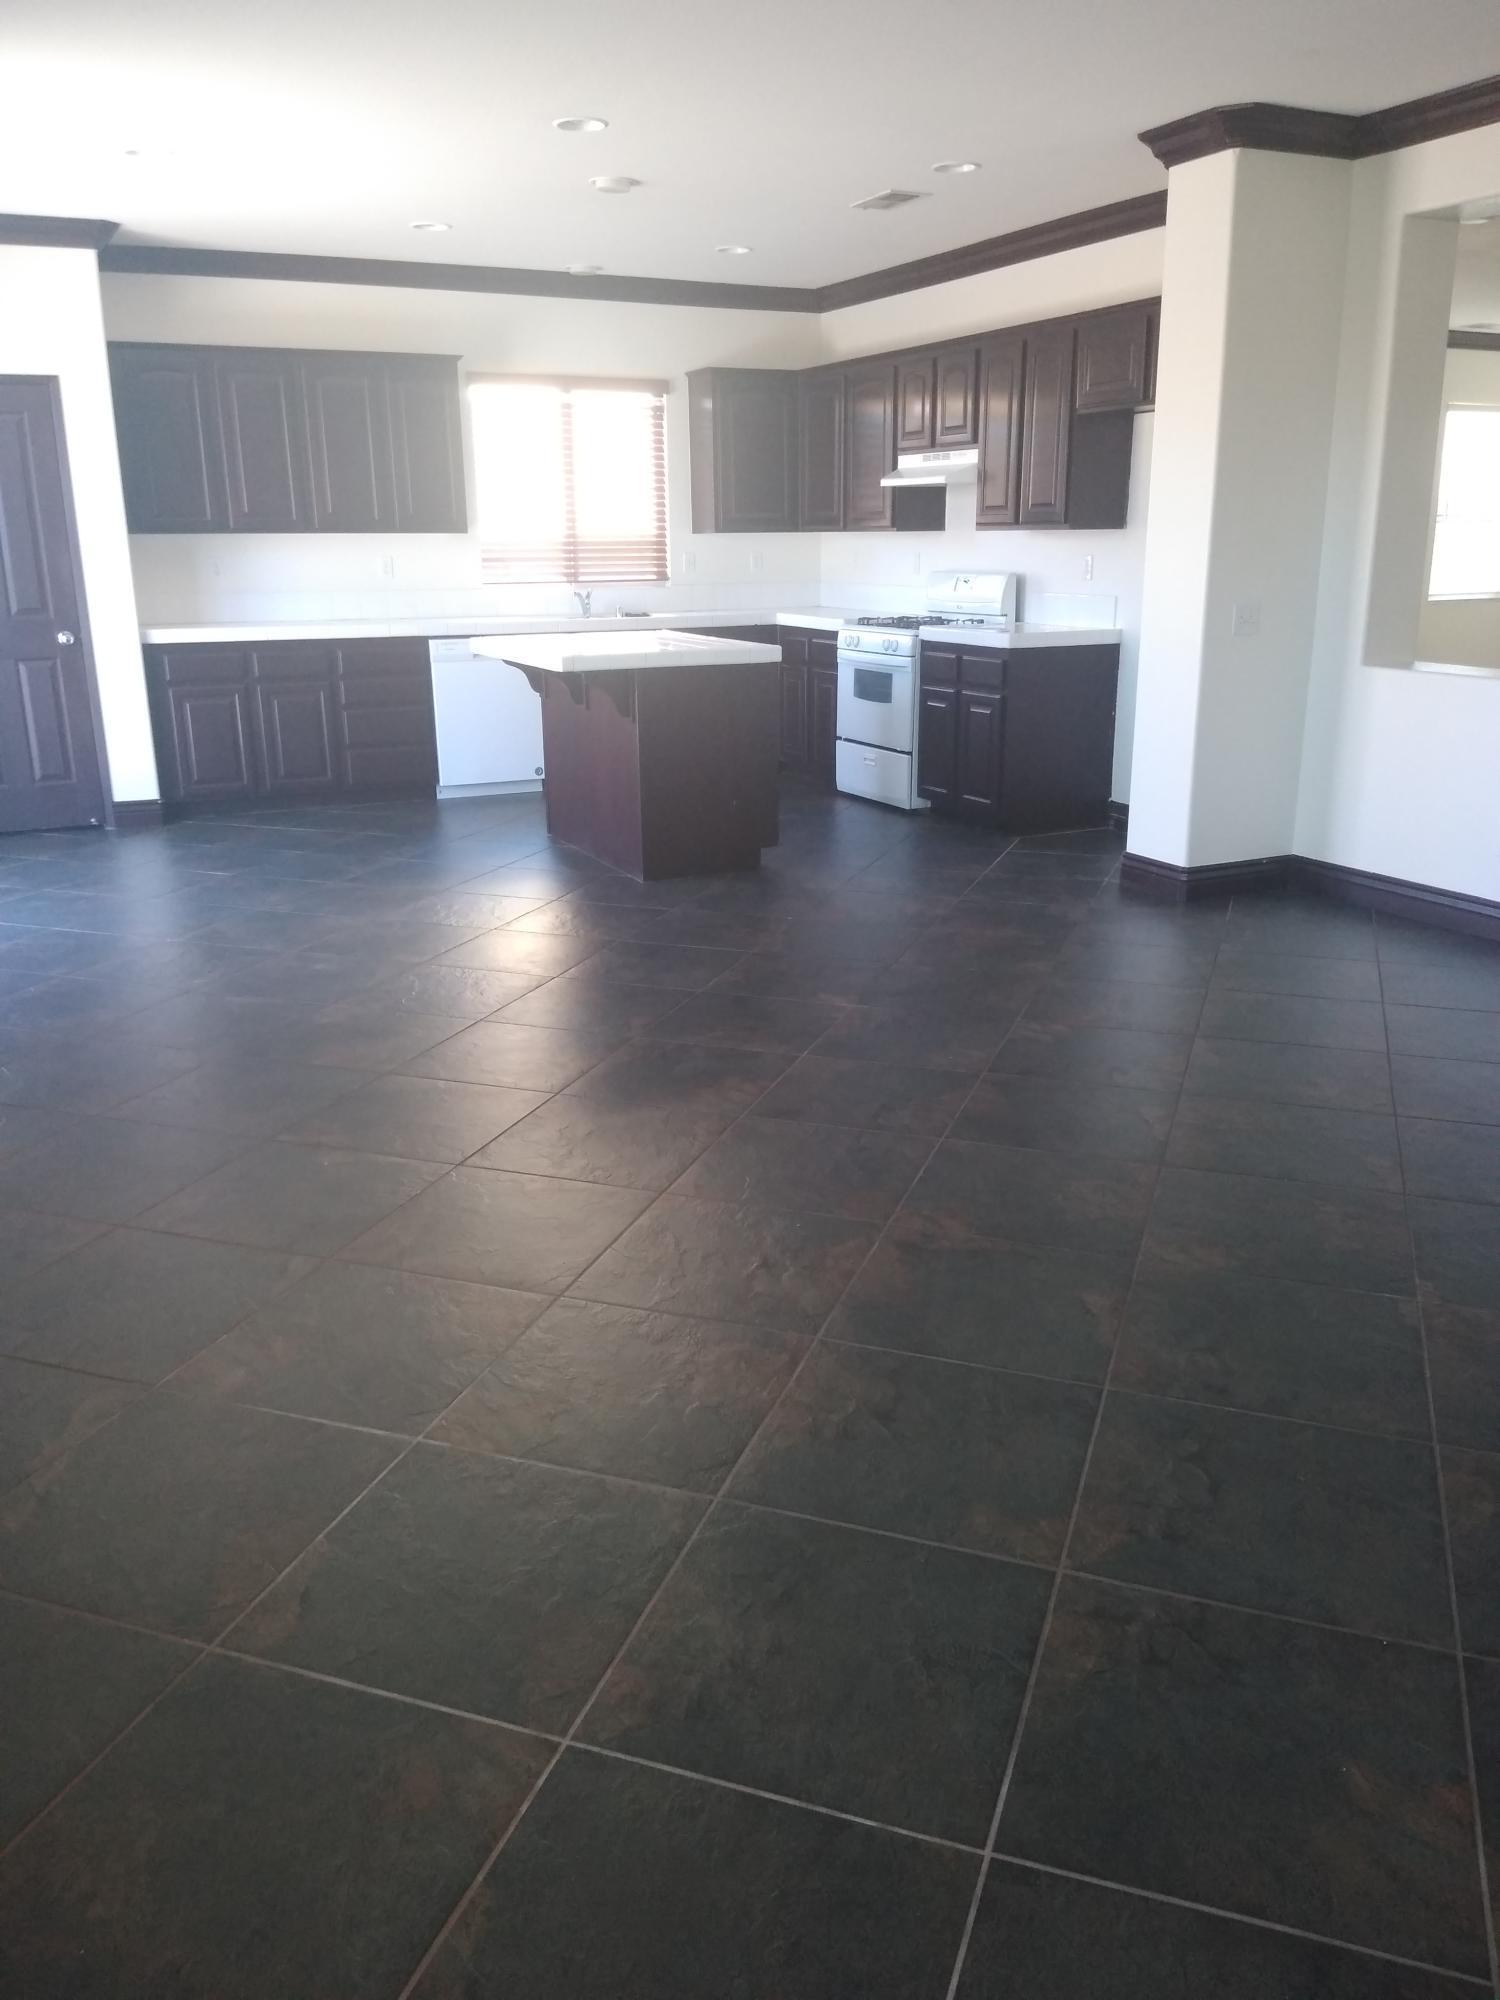 41153 Hanover Street, Indio, California 92203, 4 Bedrooms Bedrooms, ,2 BathroomsBathrooms,Residential,For Sale,41153 Hanover Street,219041607